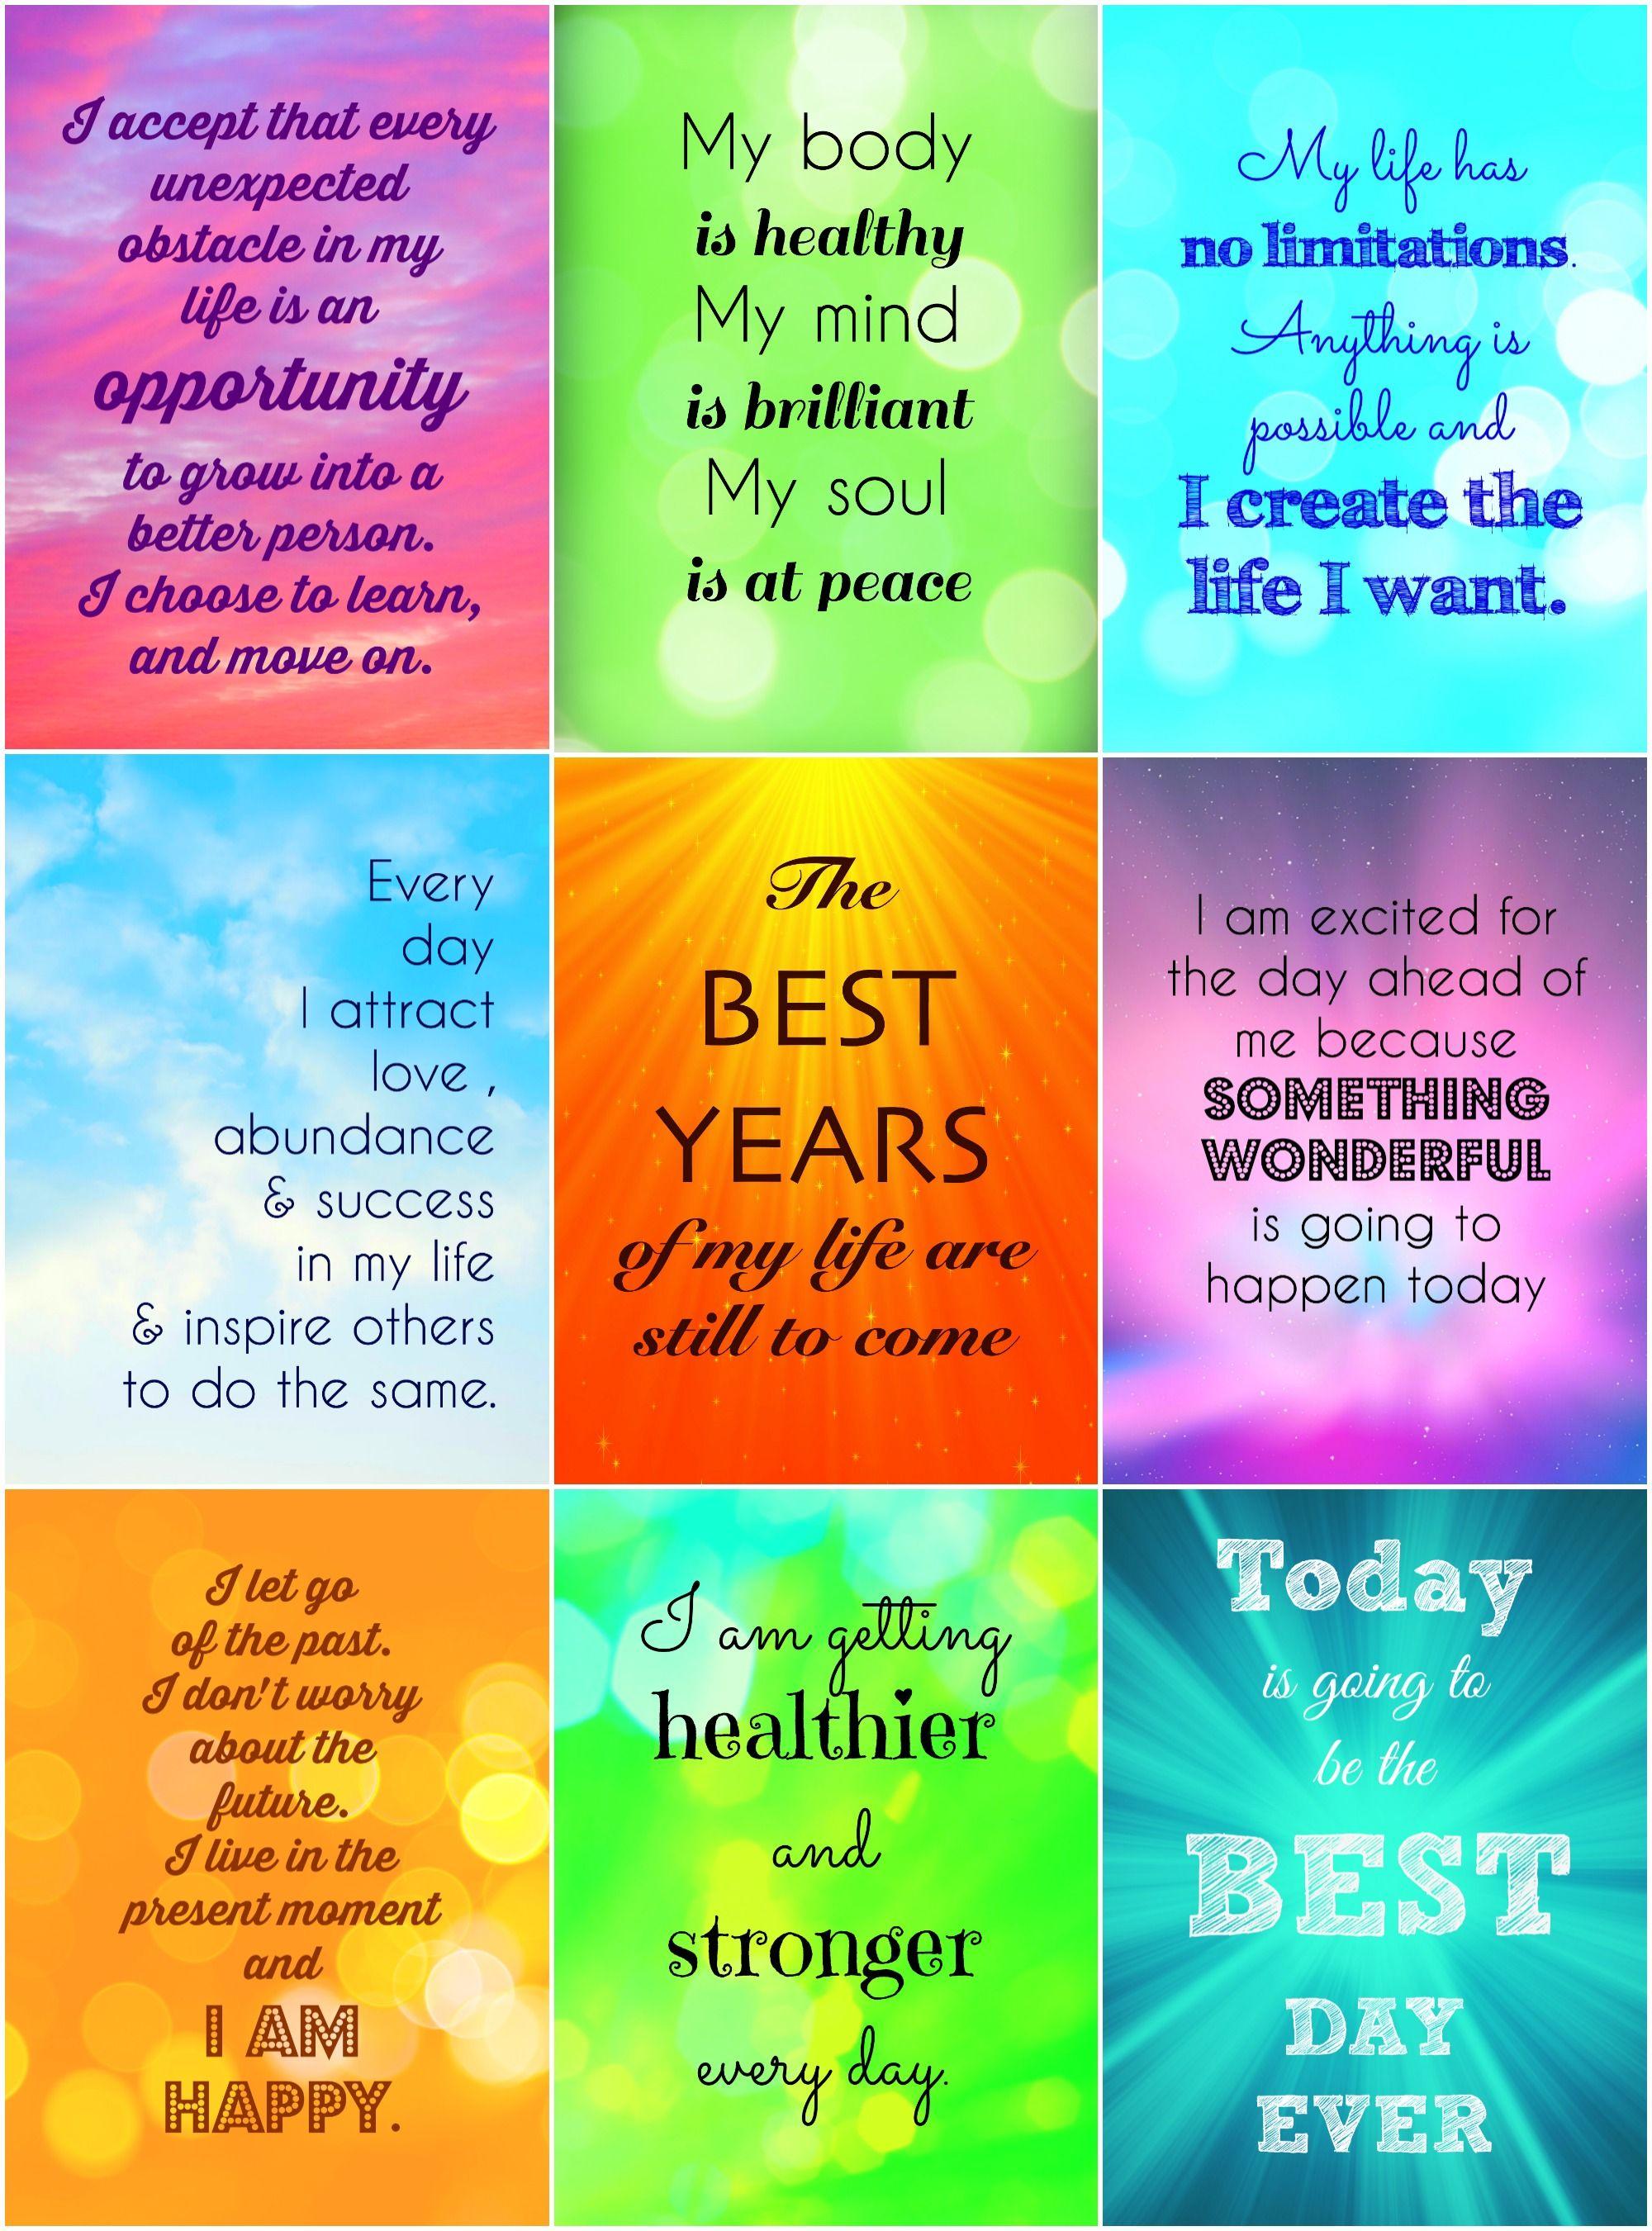 Amazon Com Daily Positive Affirmation Cards Health Personal Care Positive Affirmation Cards Positive Affirmations Daily Positive Affirmations